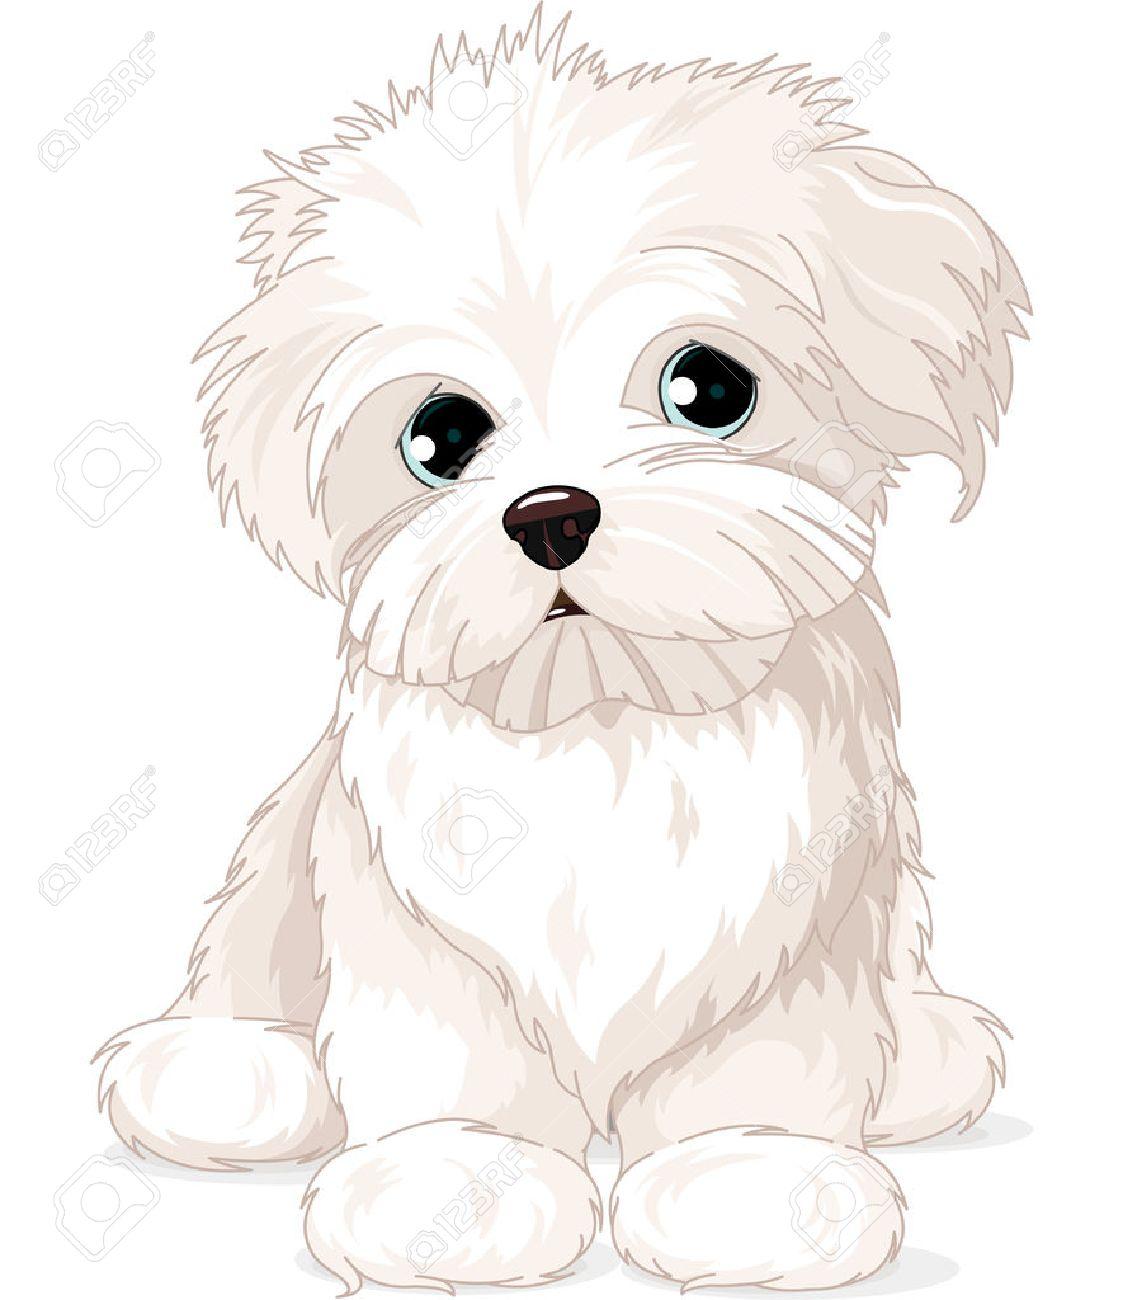 clipart maltese puppy dog royalty free cliparts vectors and stock rh 123rf com maltese flag clipart maltese dog clipart